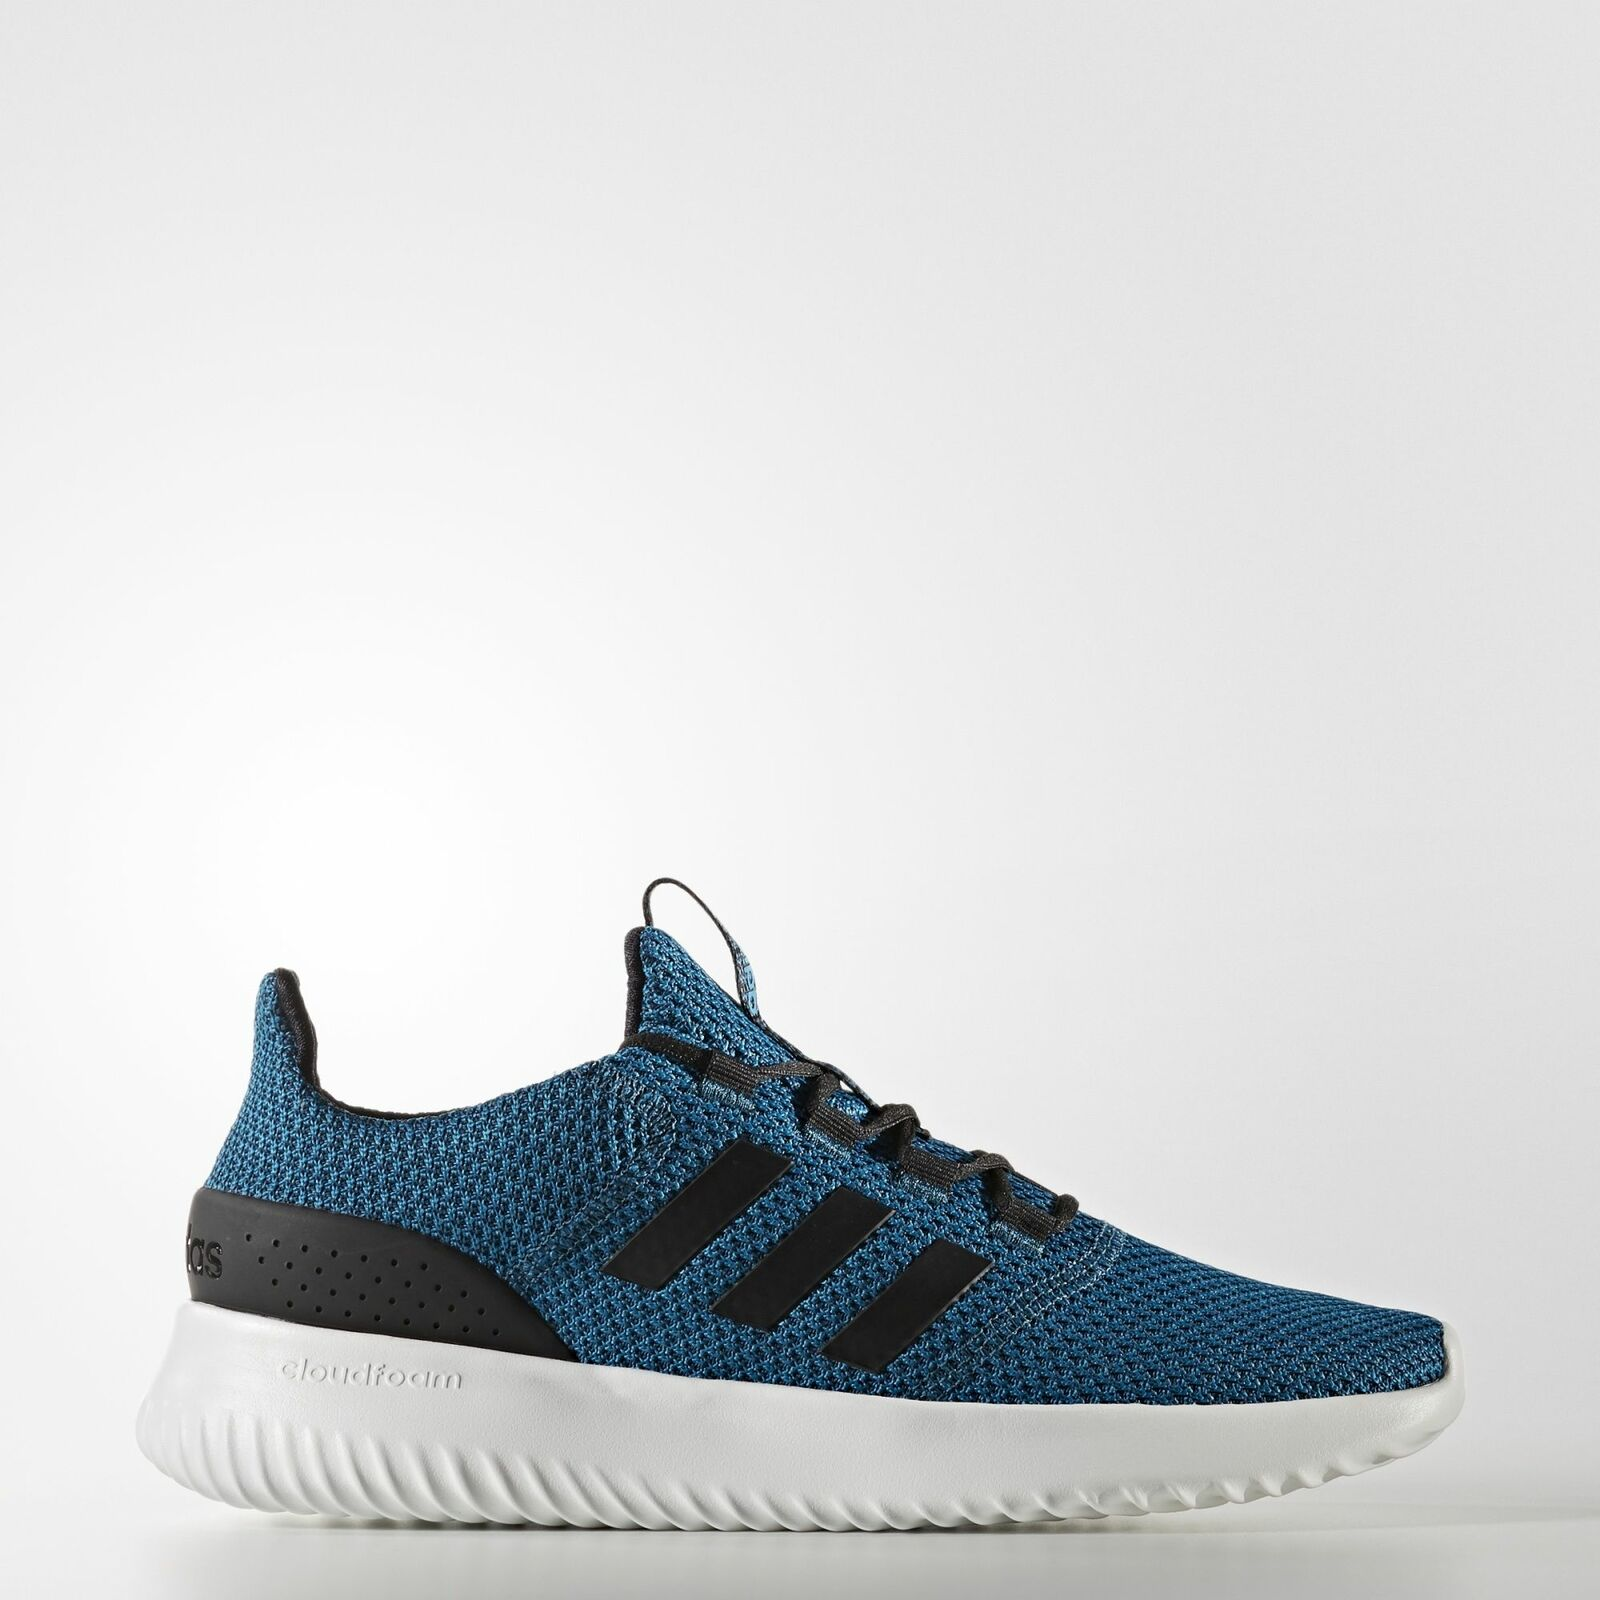 Adidas Neo Cloudfoam Ultimate Herren Sportschuh Blau Petrol Gr 6,5 - 13,5